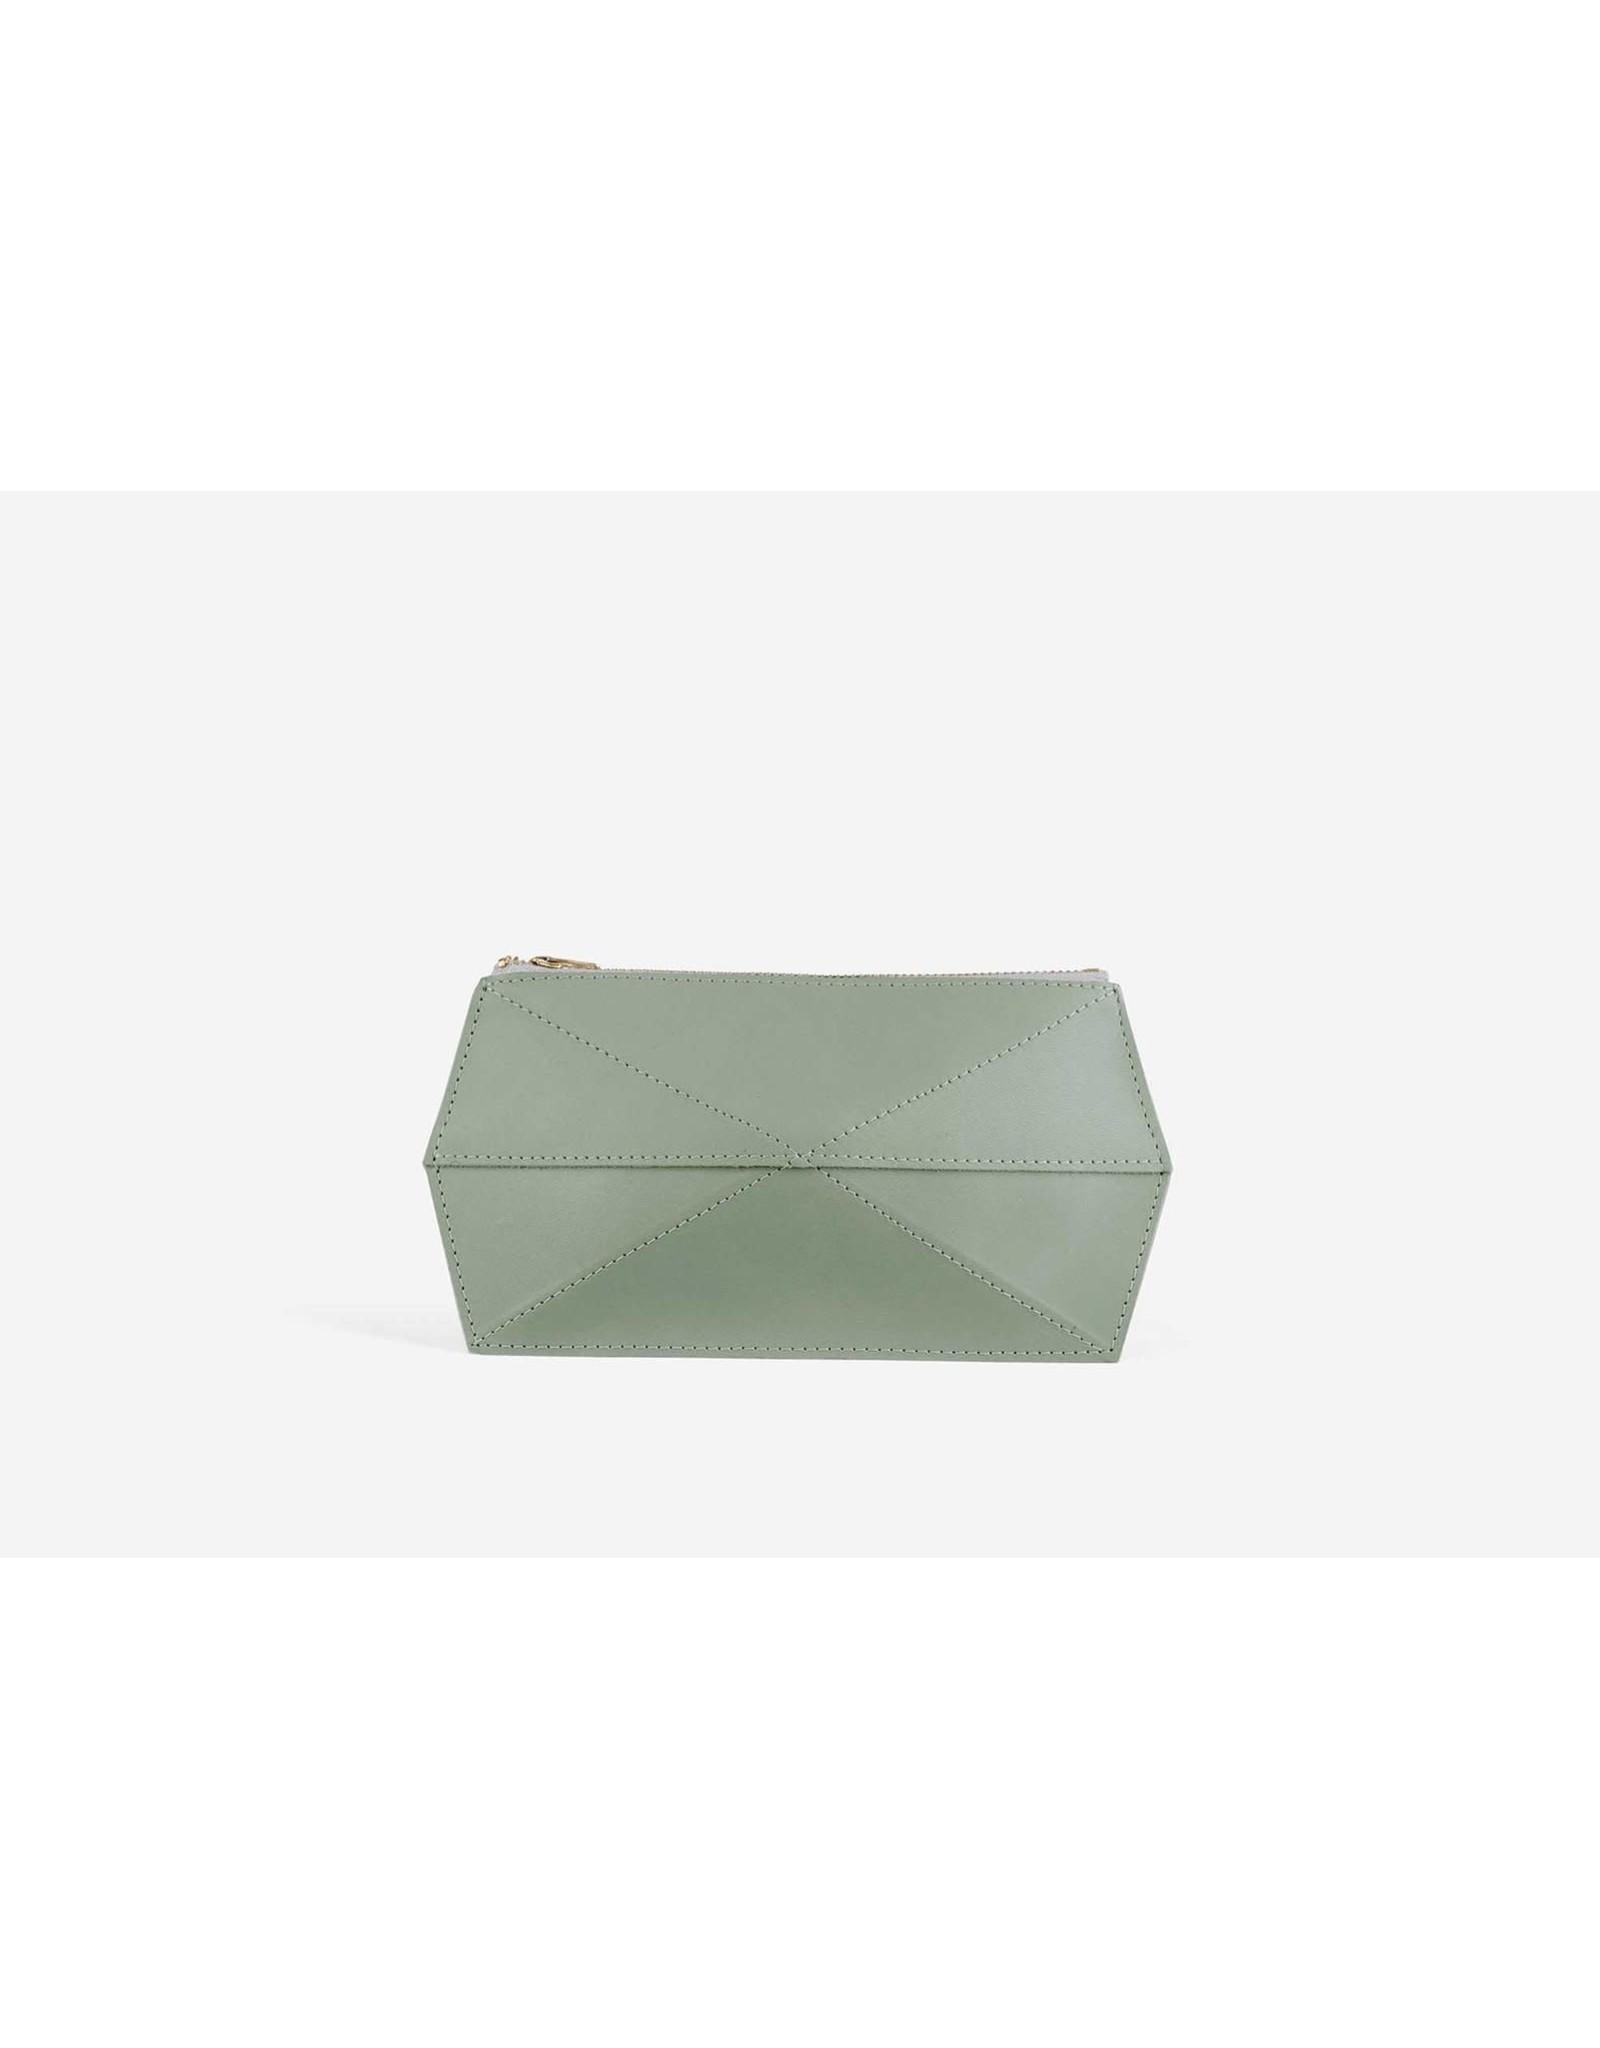 Zand-erover portemonee 3D case | Mini Fold | Mint